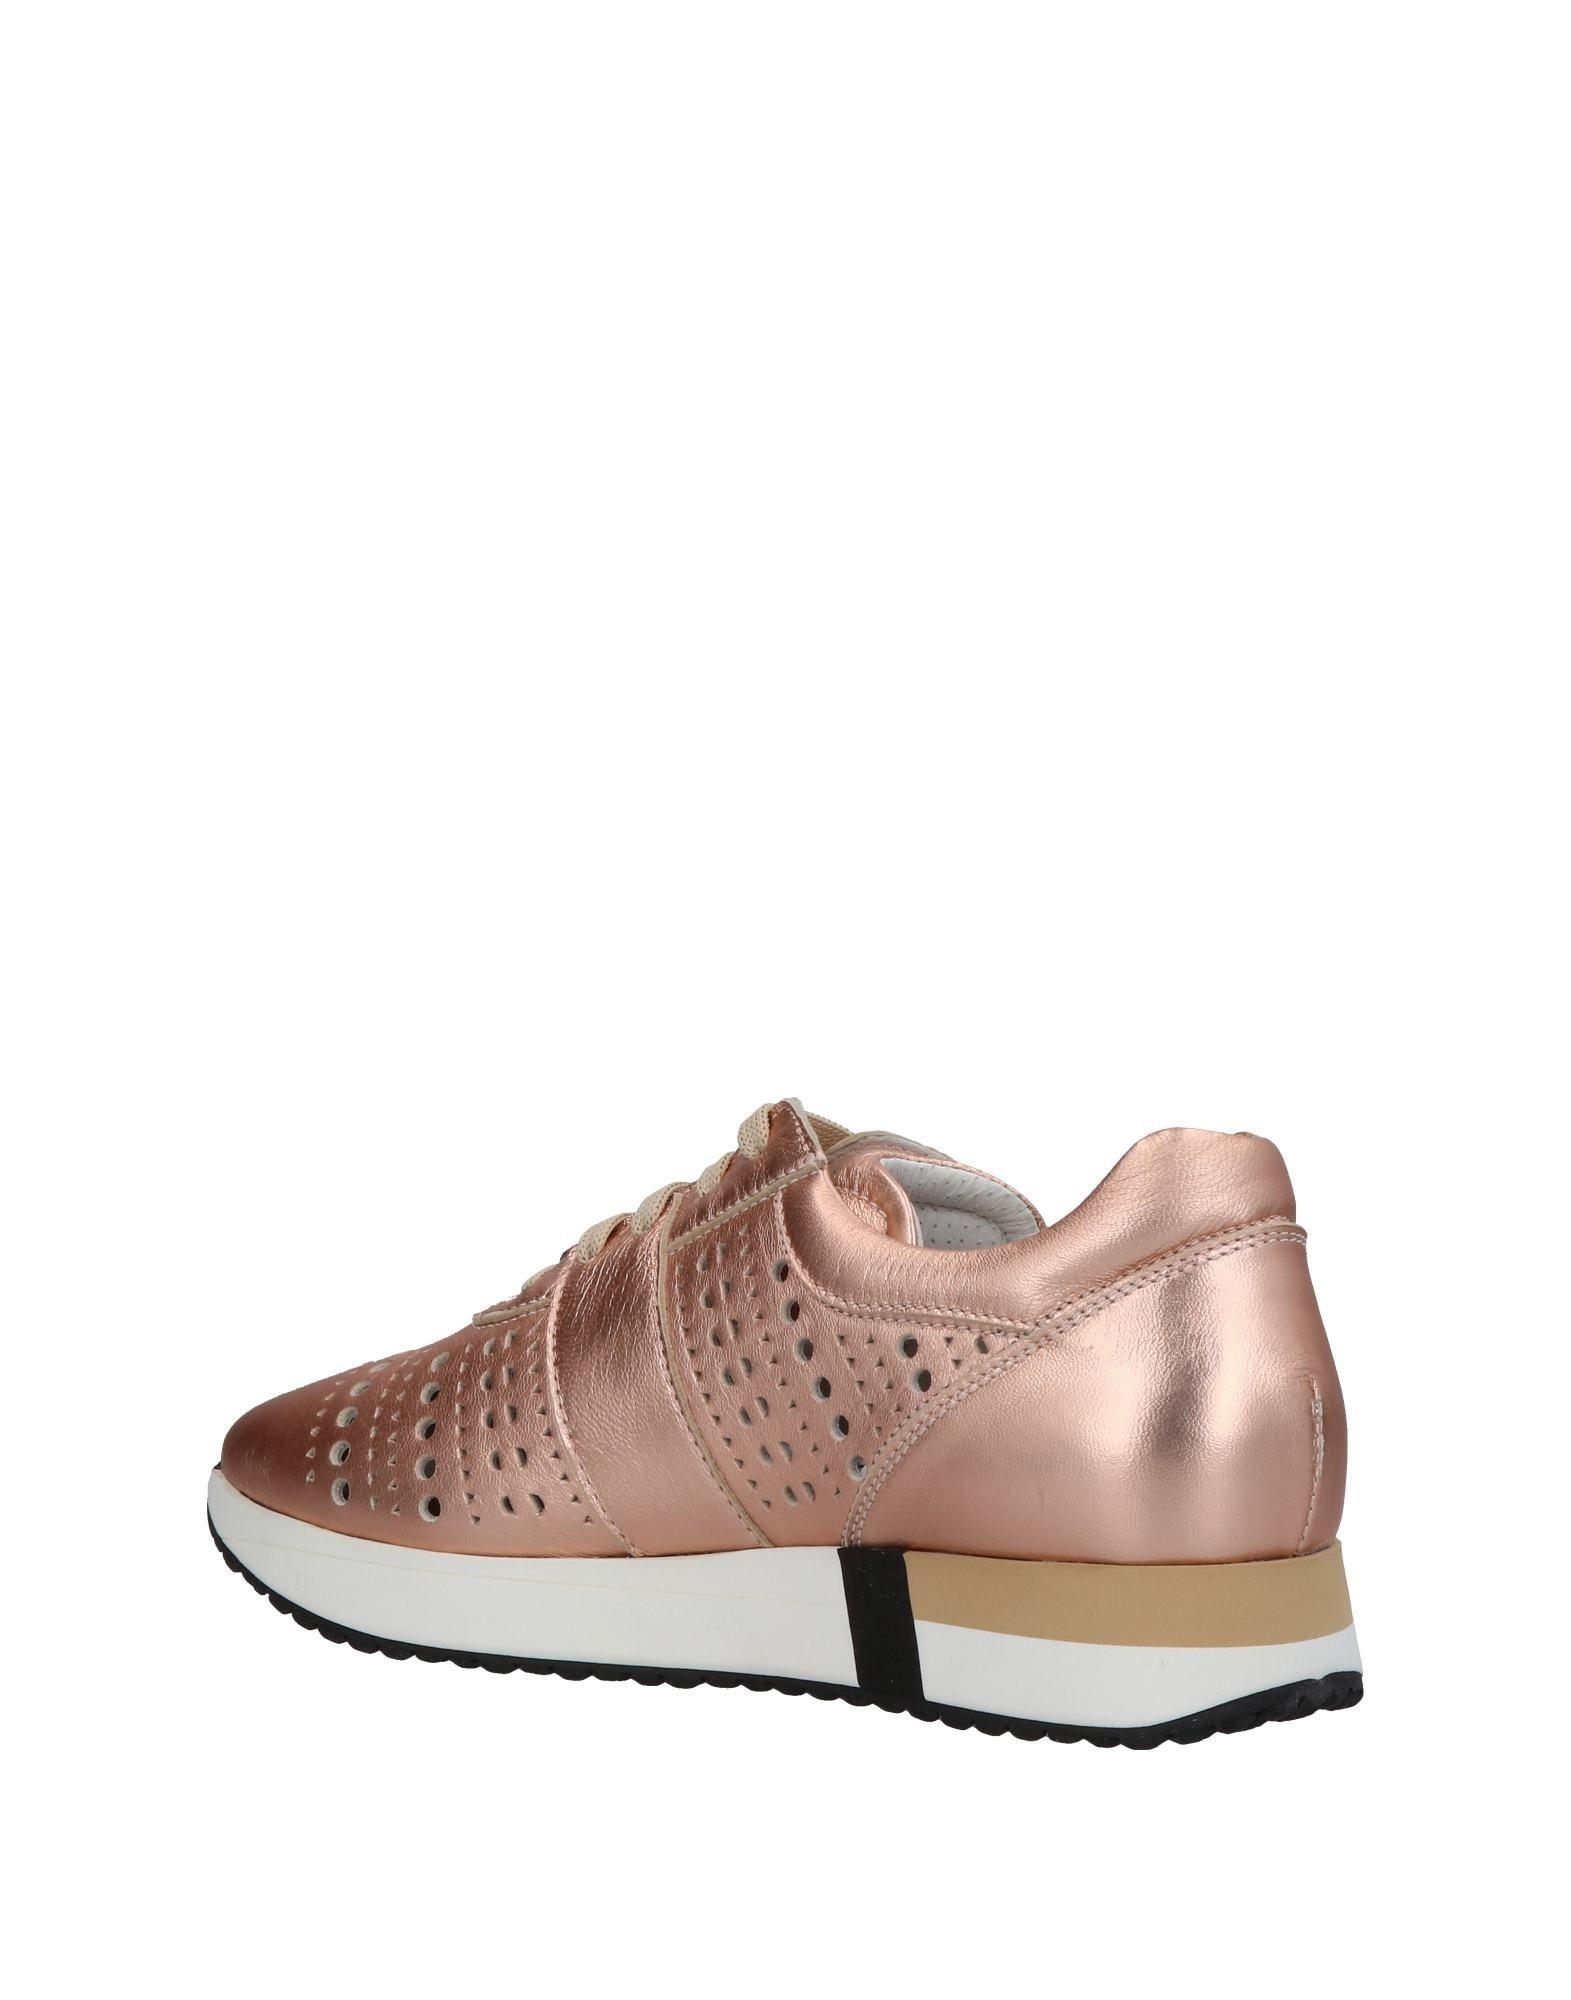 Andrea Morelli Sneakers Damen Damen Sneakers  11388240HL Neue Schuhe 5de37c